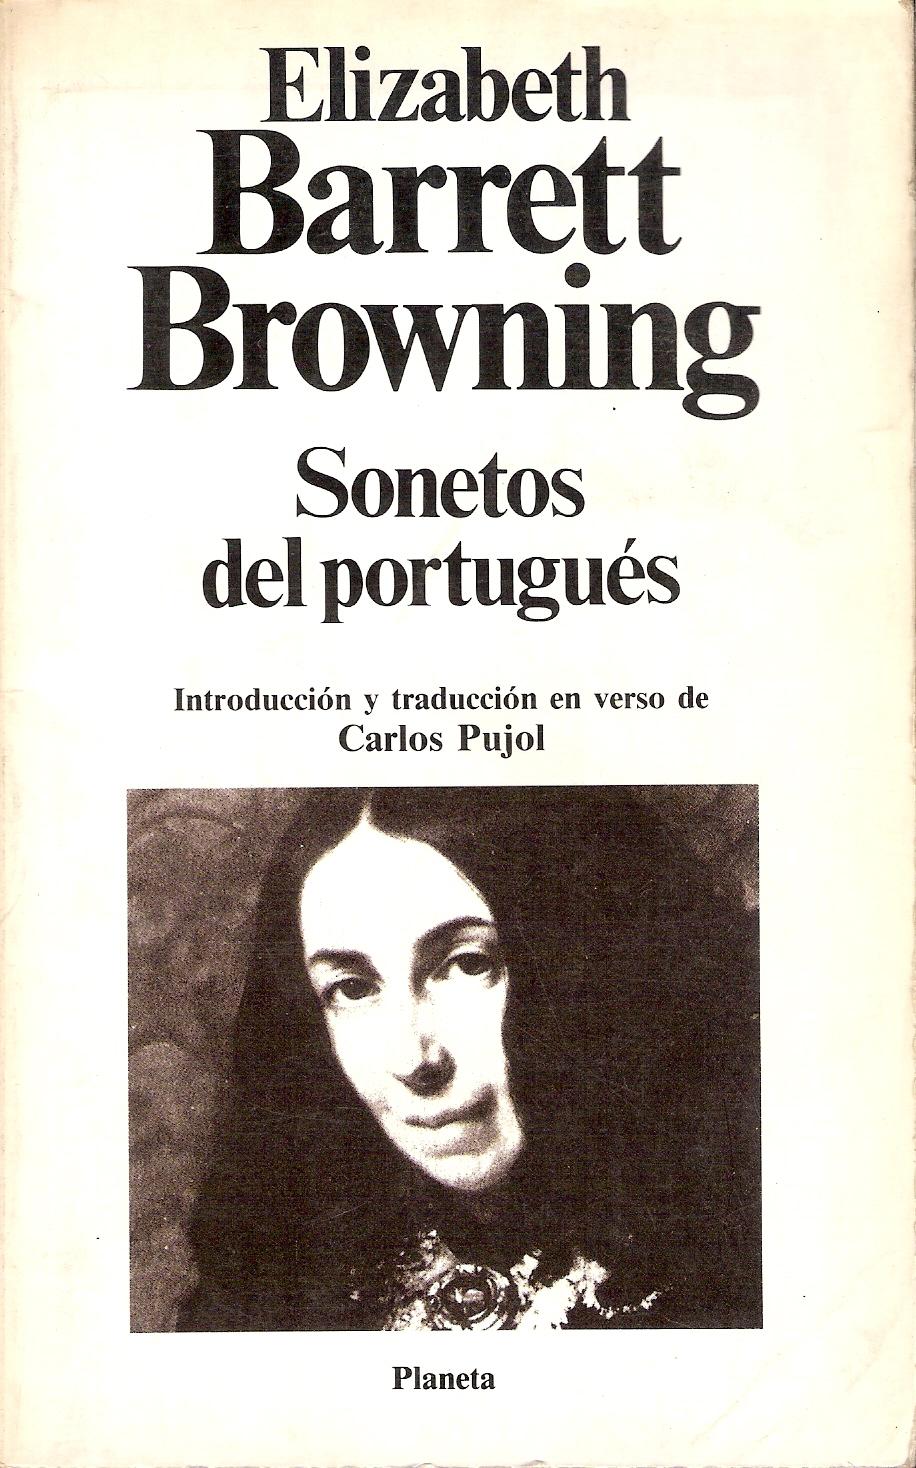 Sonetos del portugués